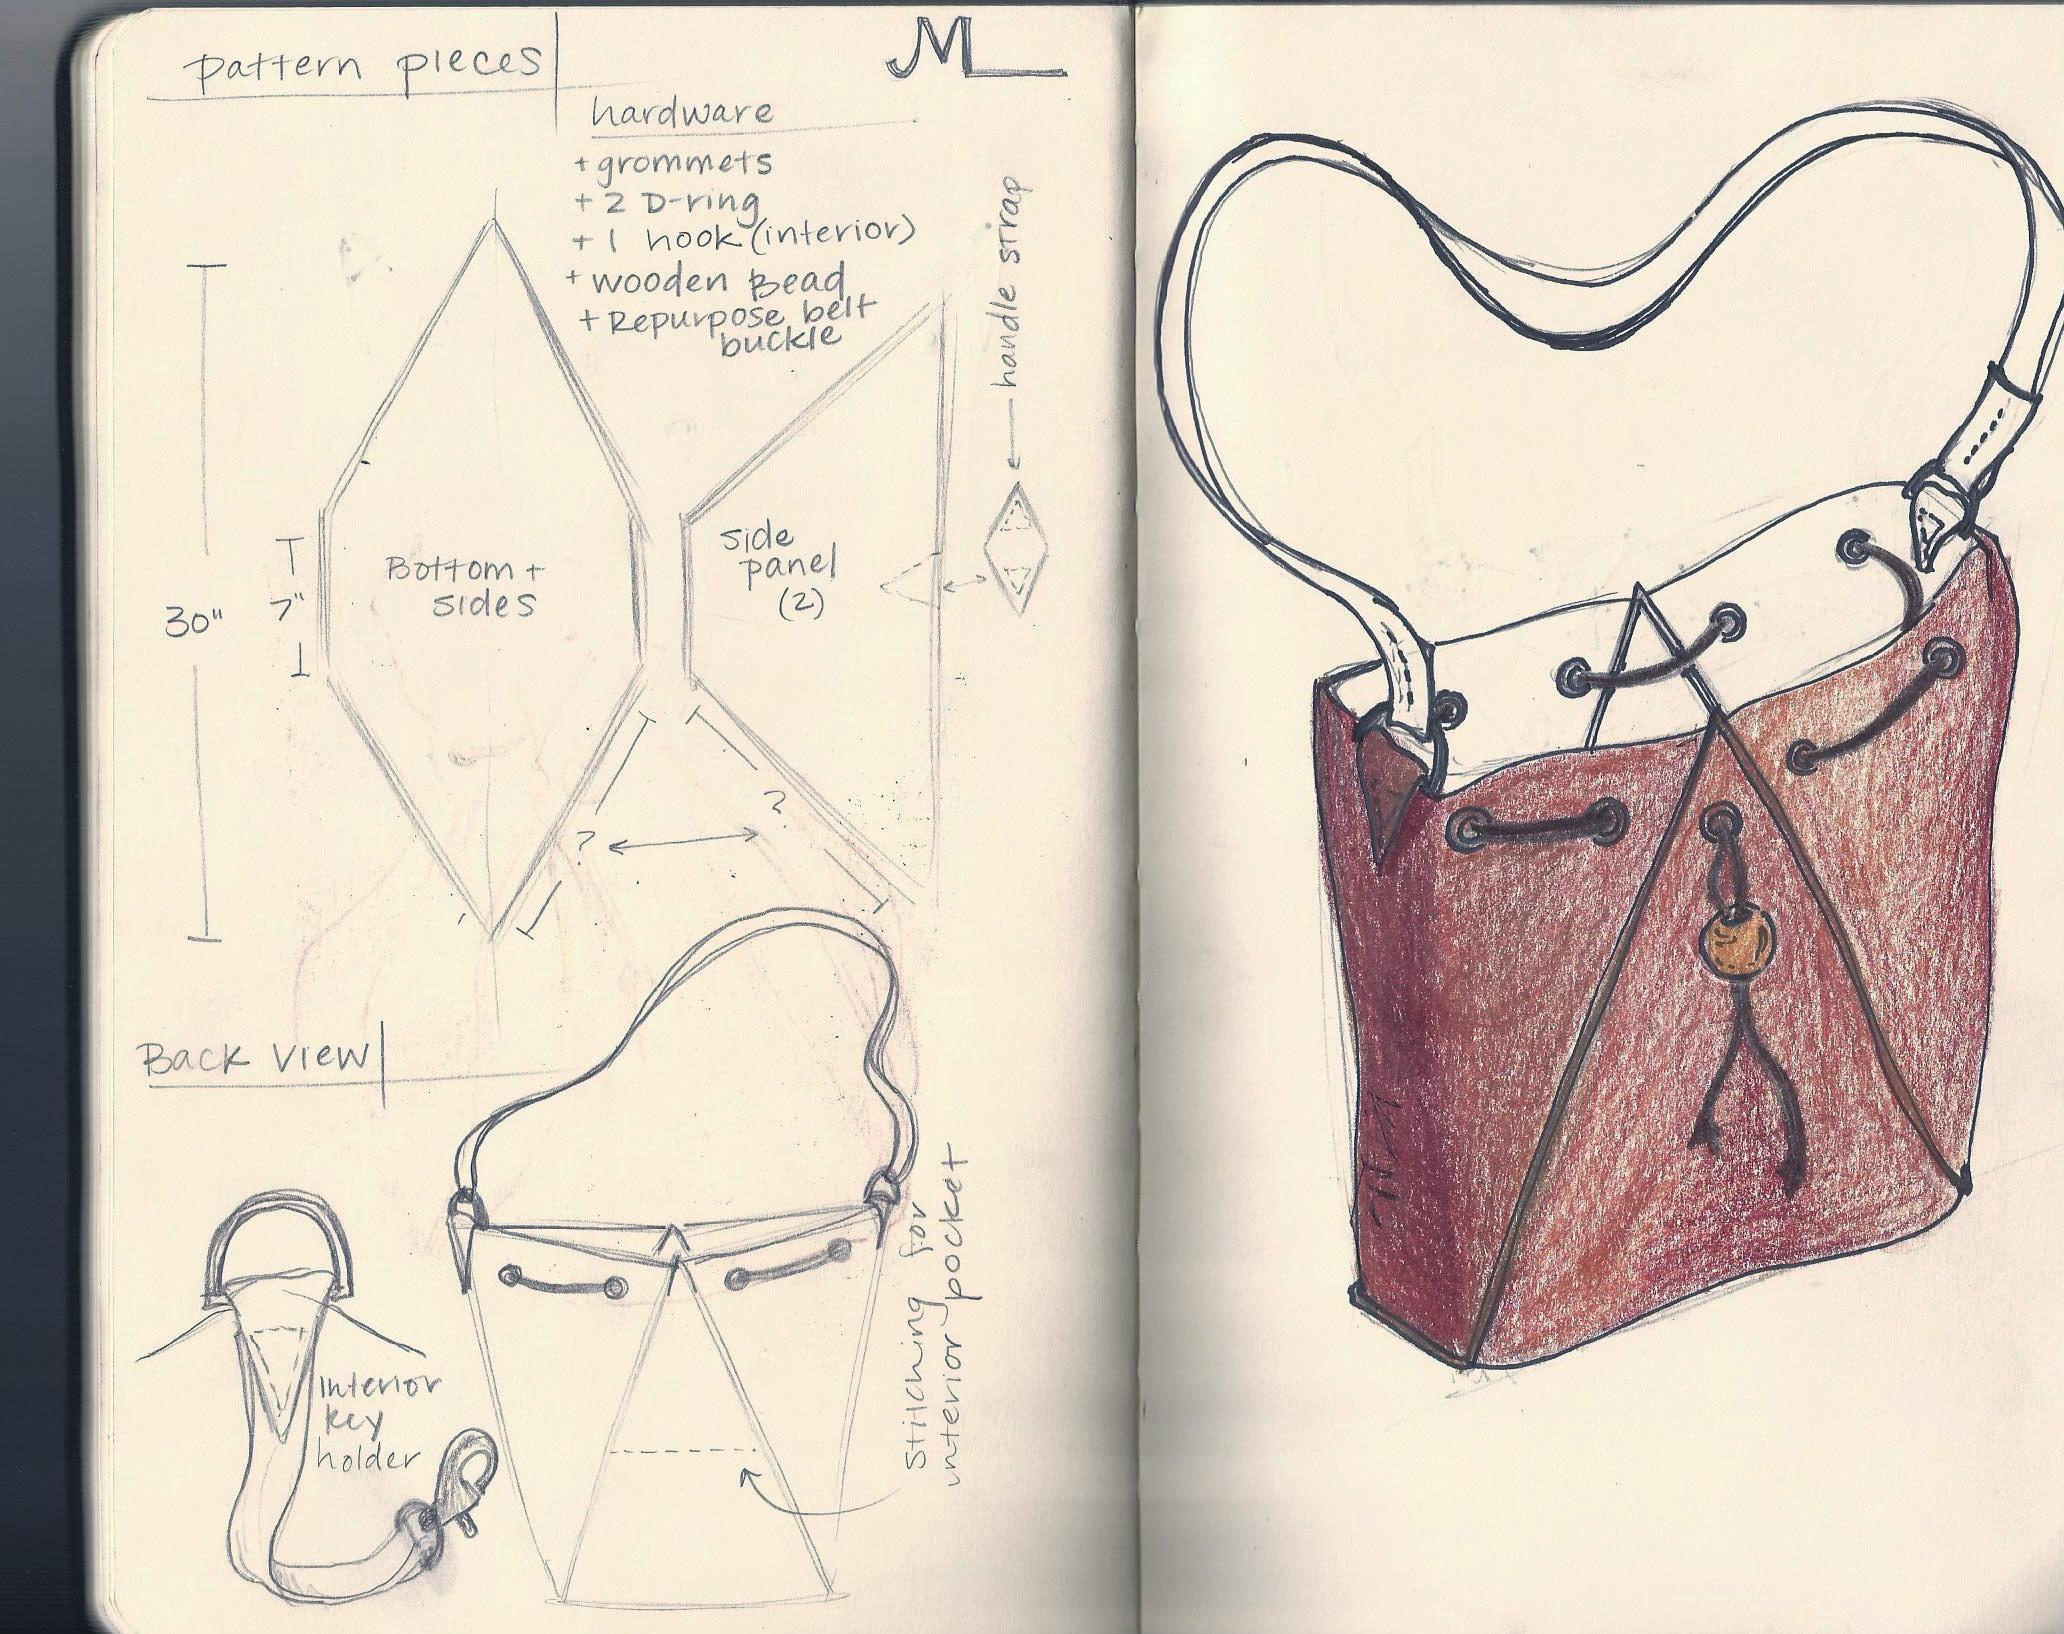 Jenna-Lagonigro-Sketchbook-2.jpg